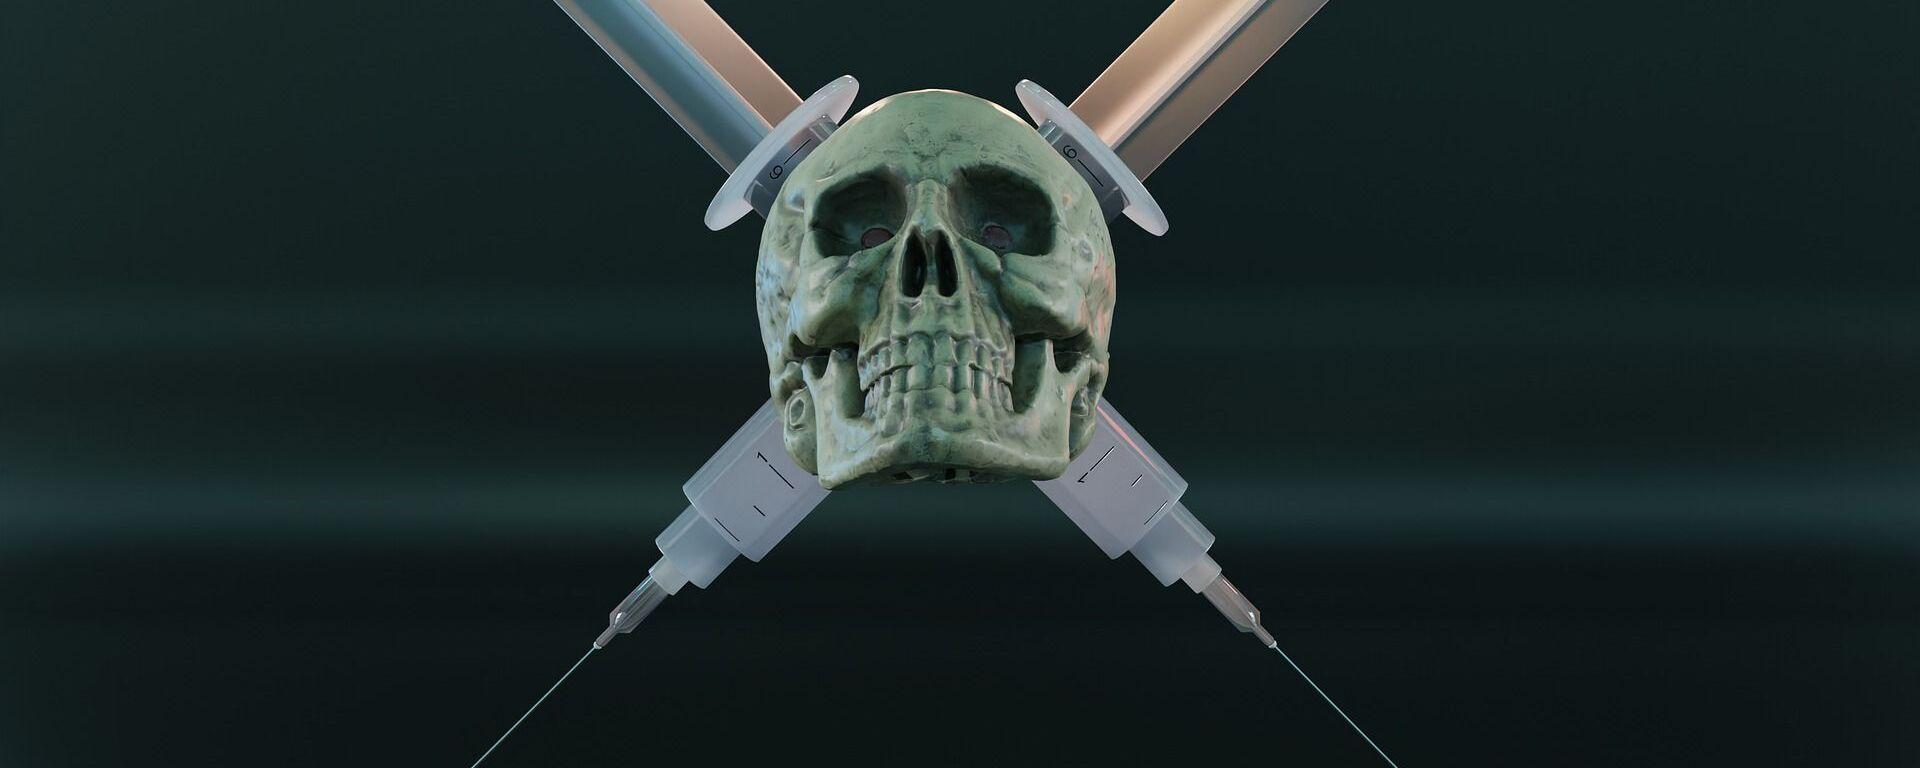 Vacuna contra coronavirus (imagen referencial) - Sputnik Mundo, 1920, 18.01.2021